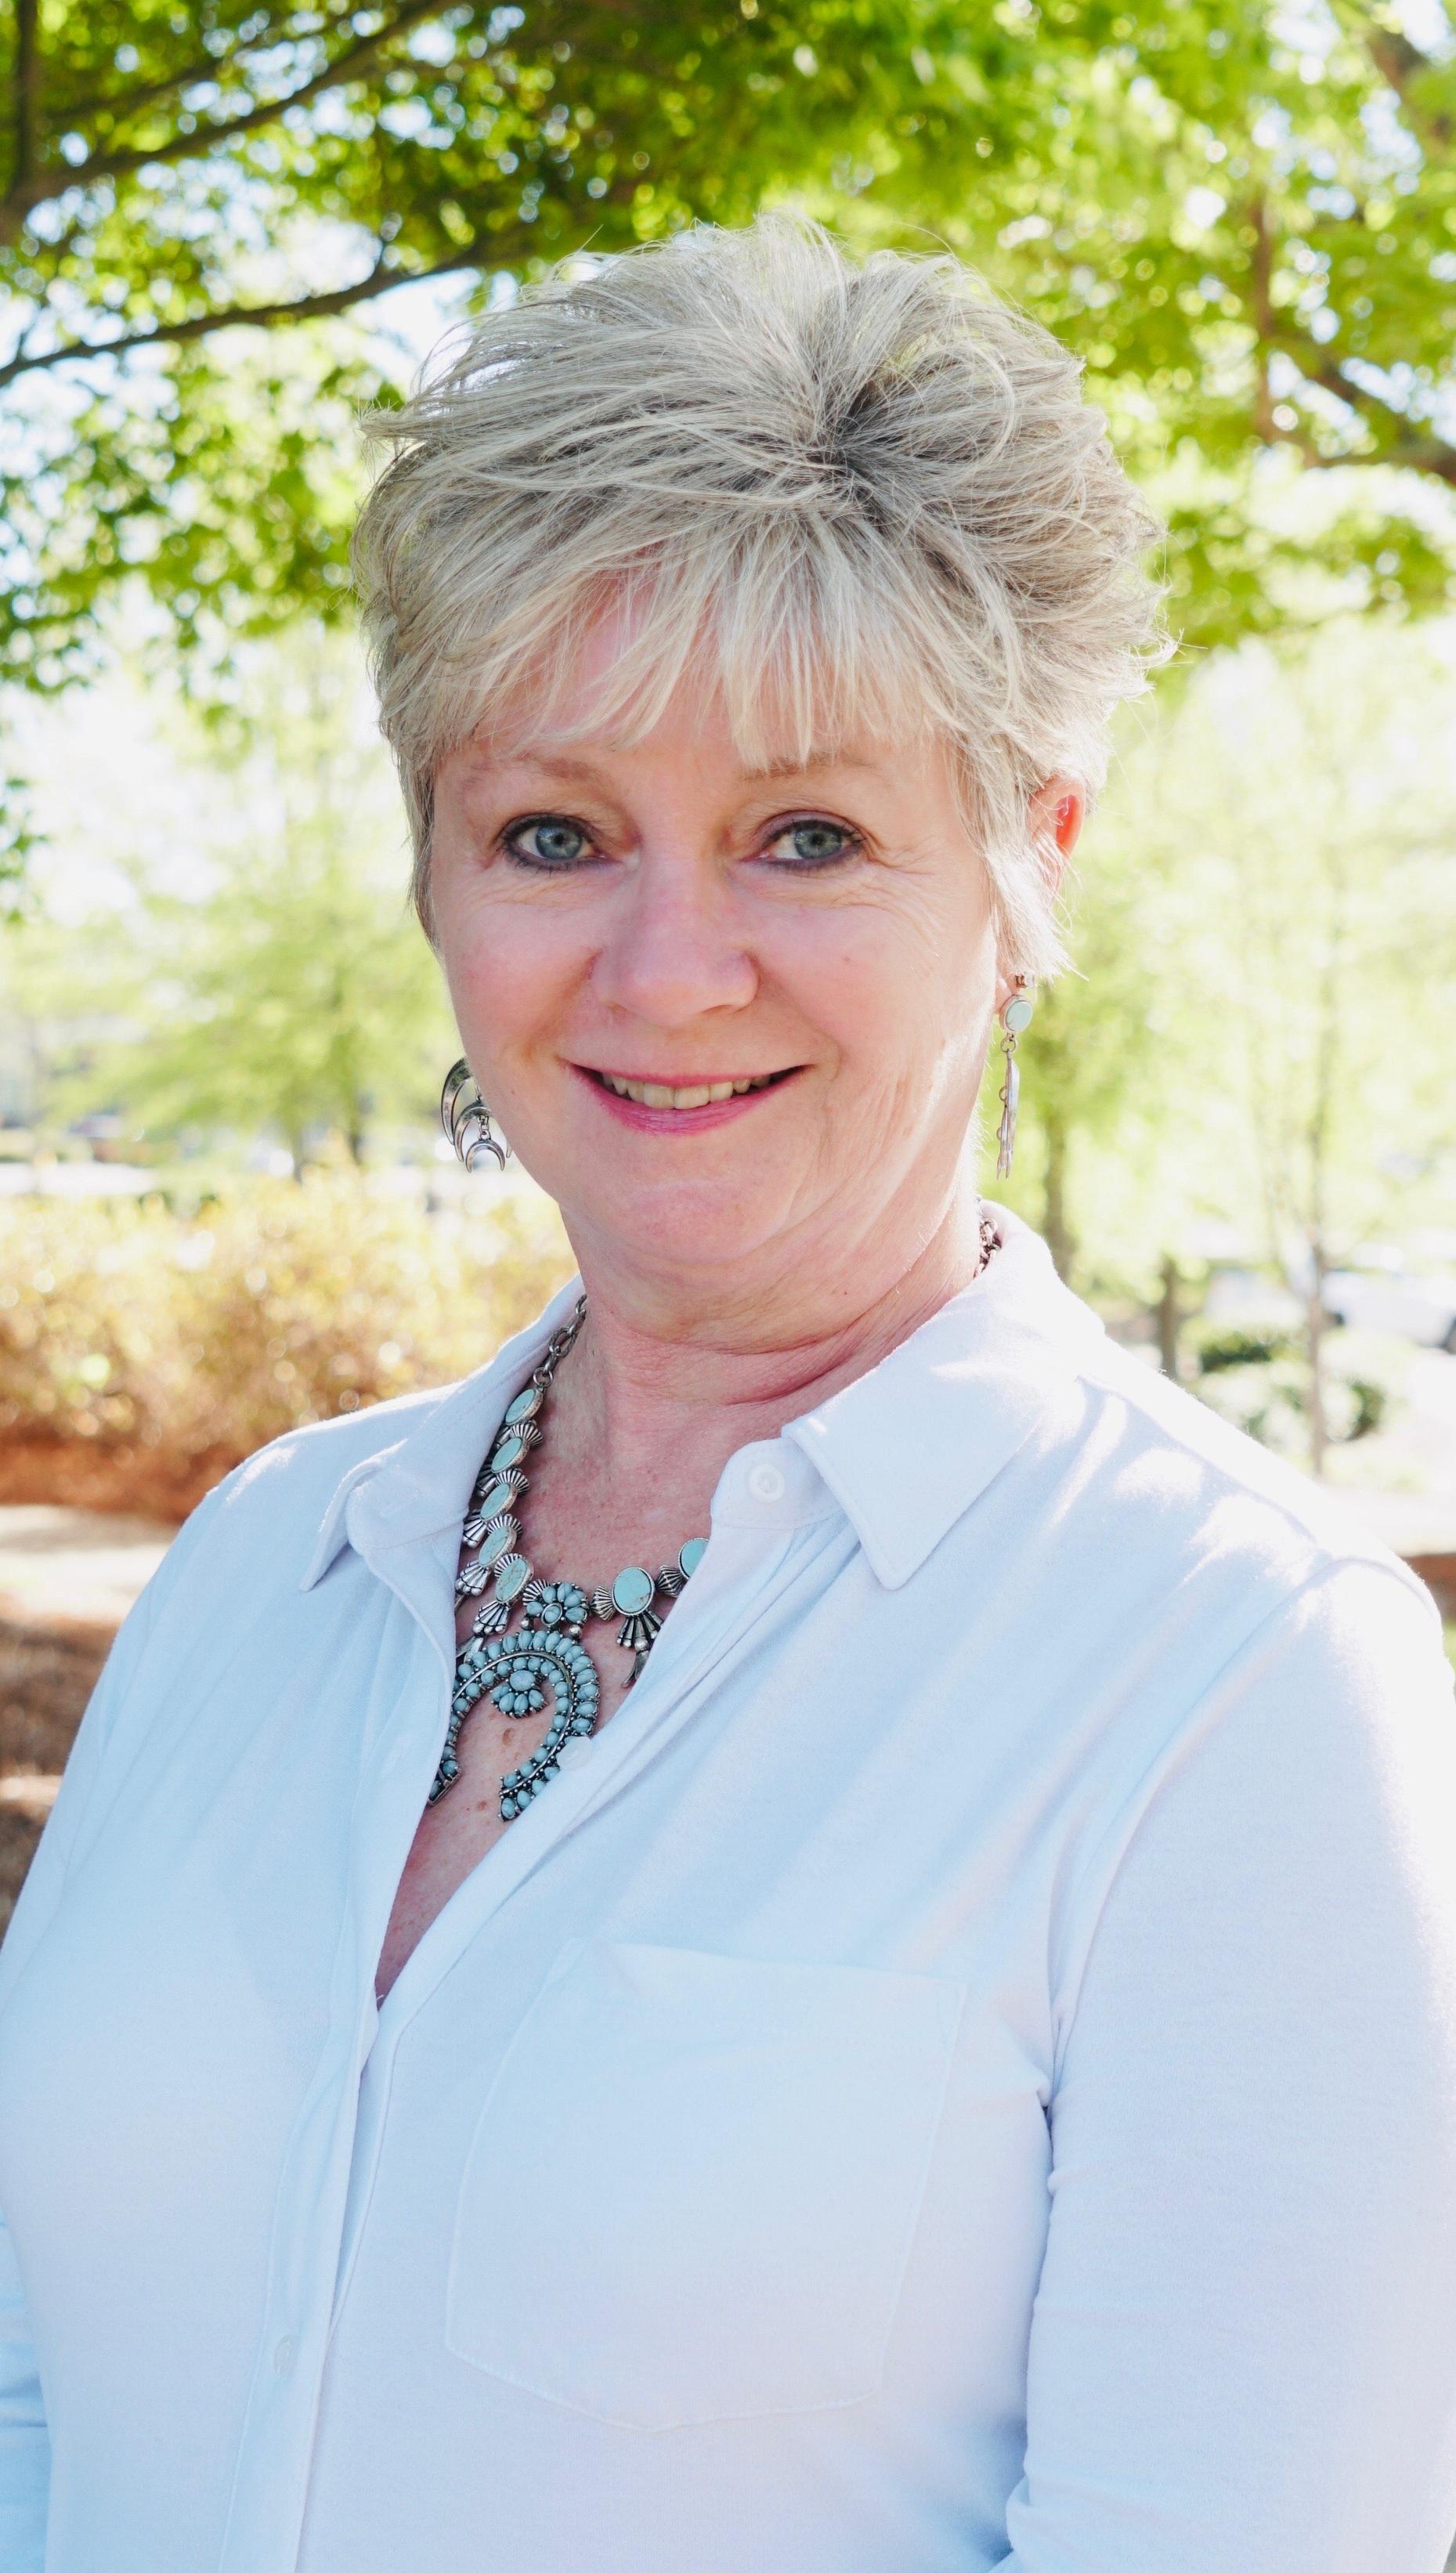 Roy Noel | Secretary, Board Member    -  Wife, Mom - Spiritual Director - Artist